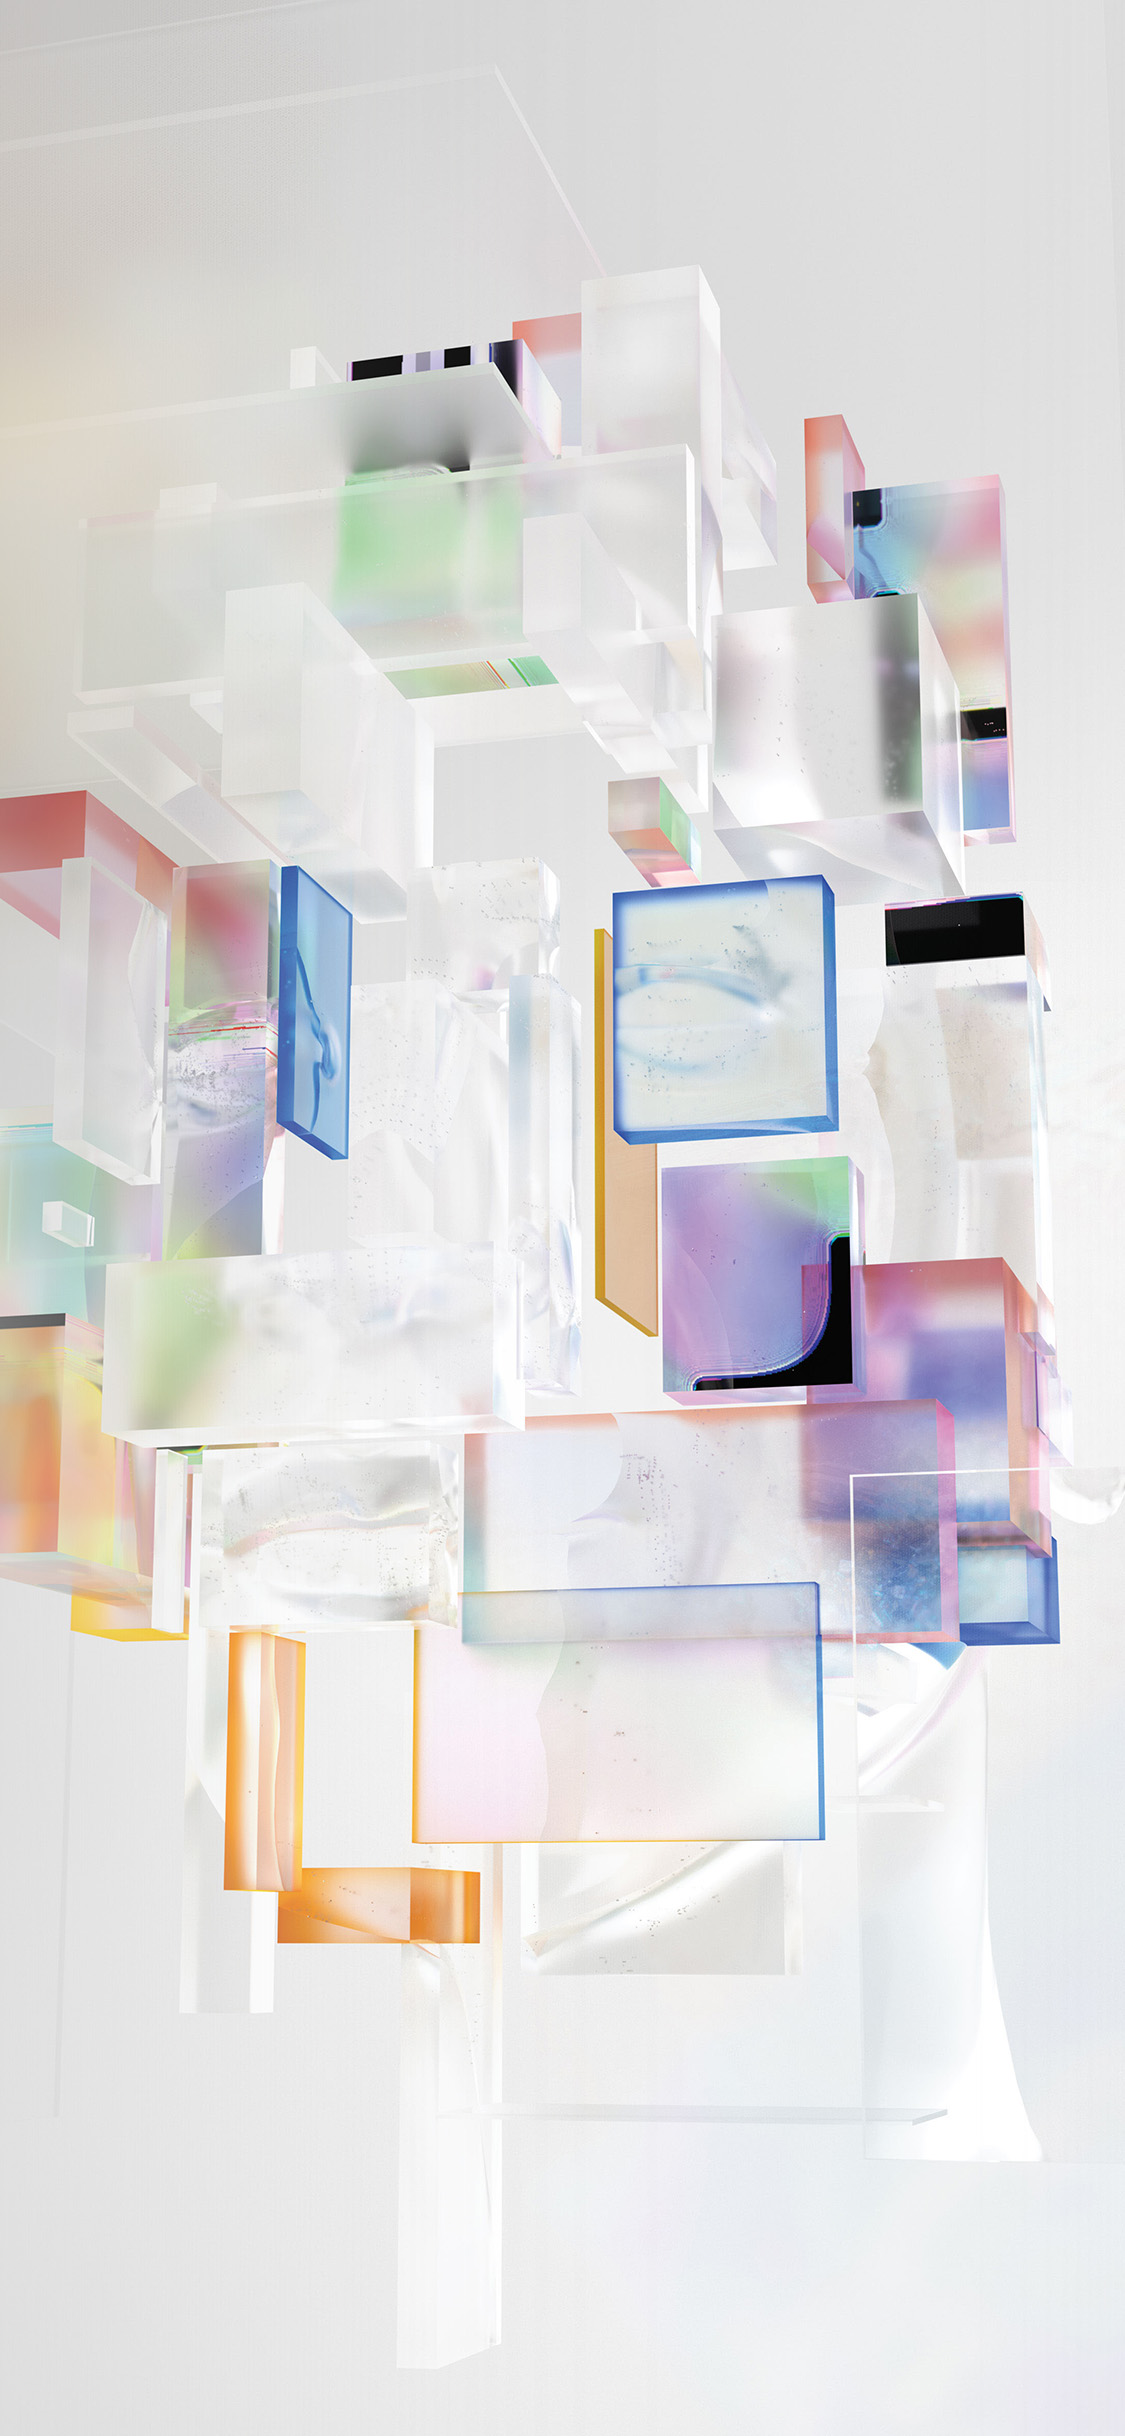 iPhonexpapers.com-Apple-iPhone-wallpaper-bg98-glass-minimal-simple-digital-clear-art